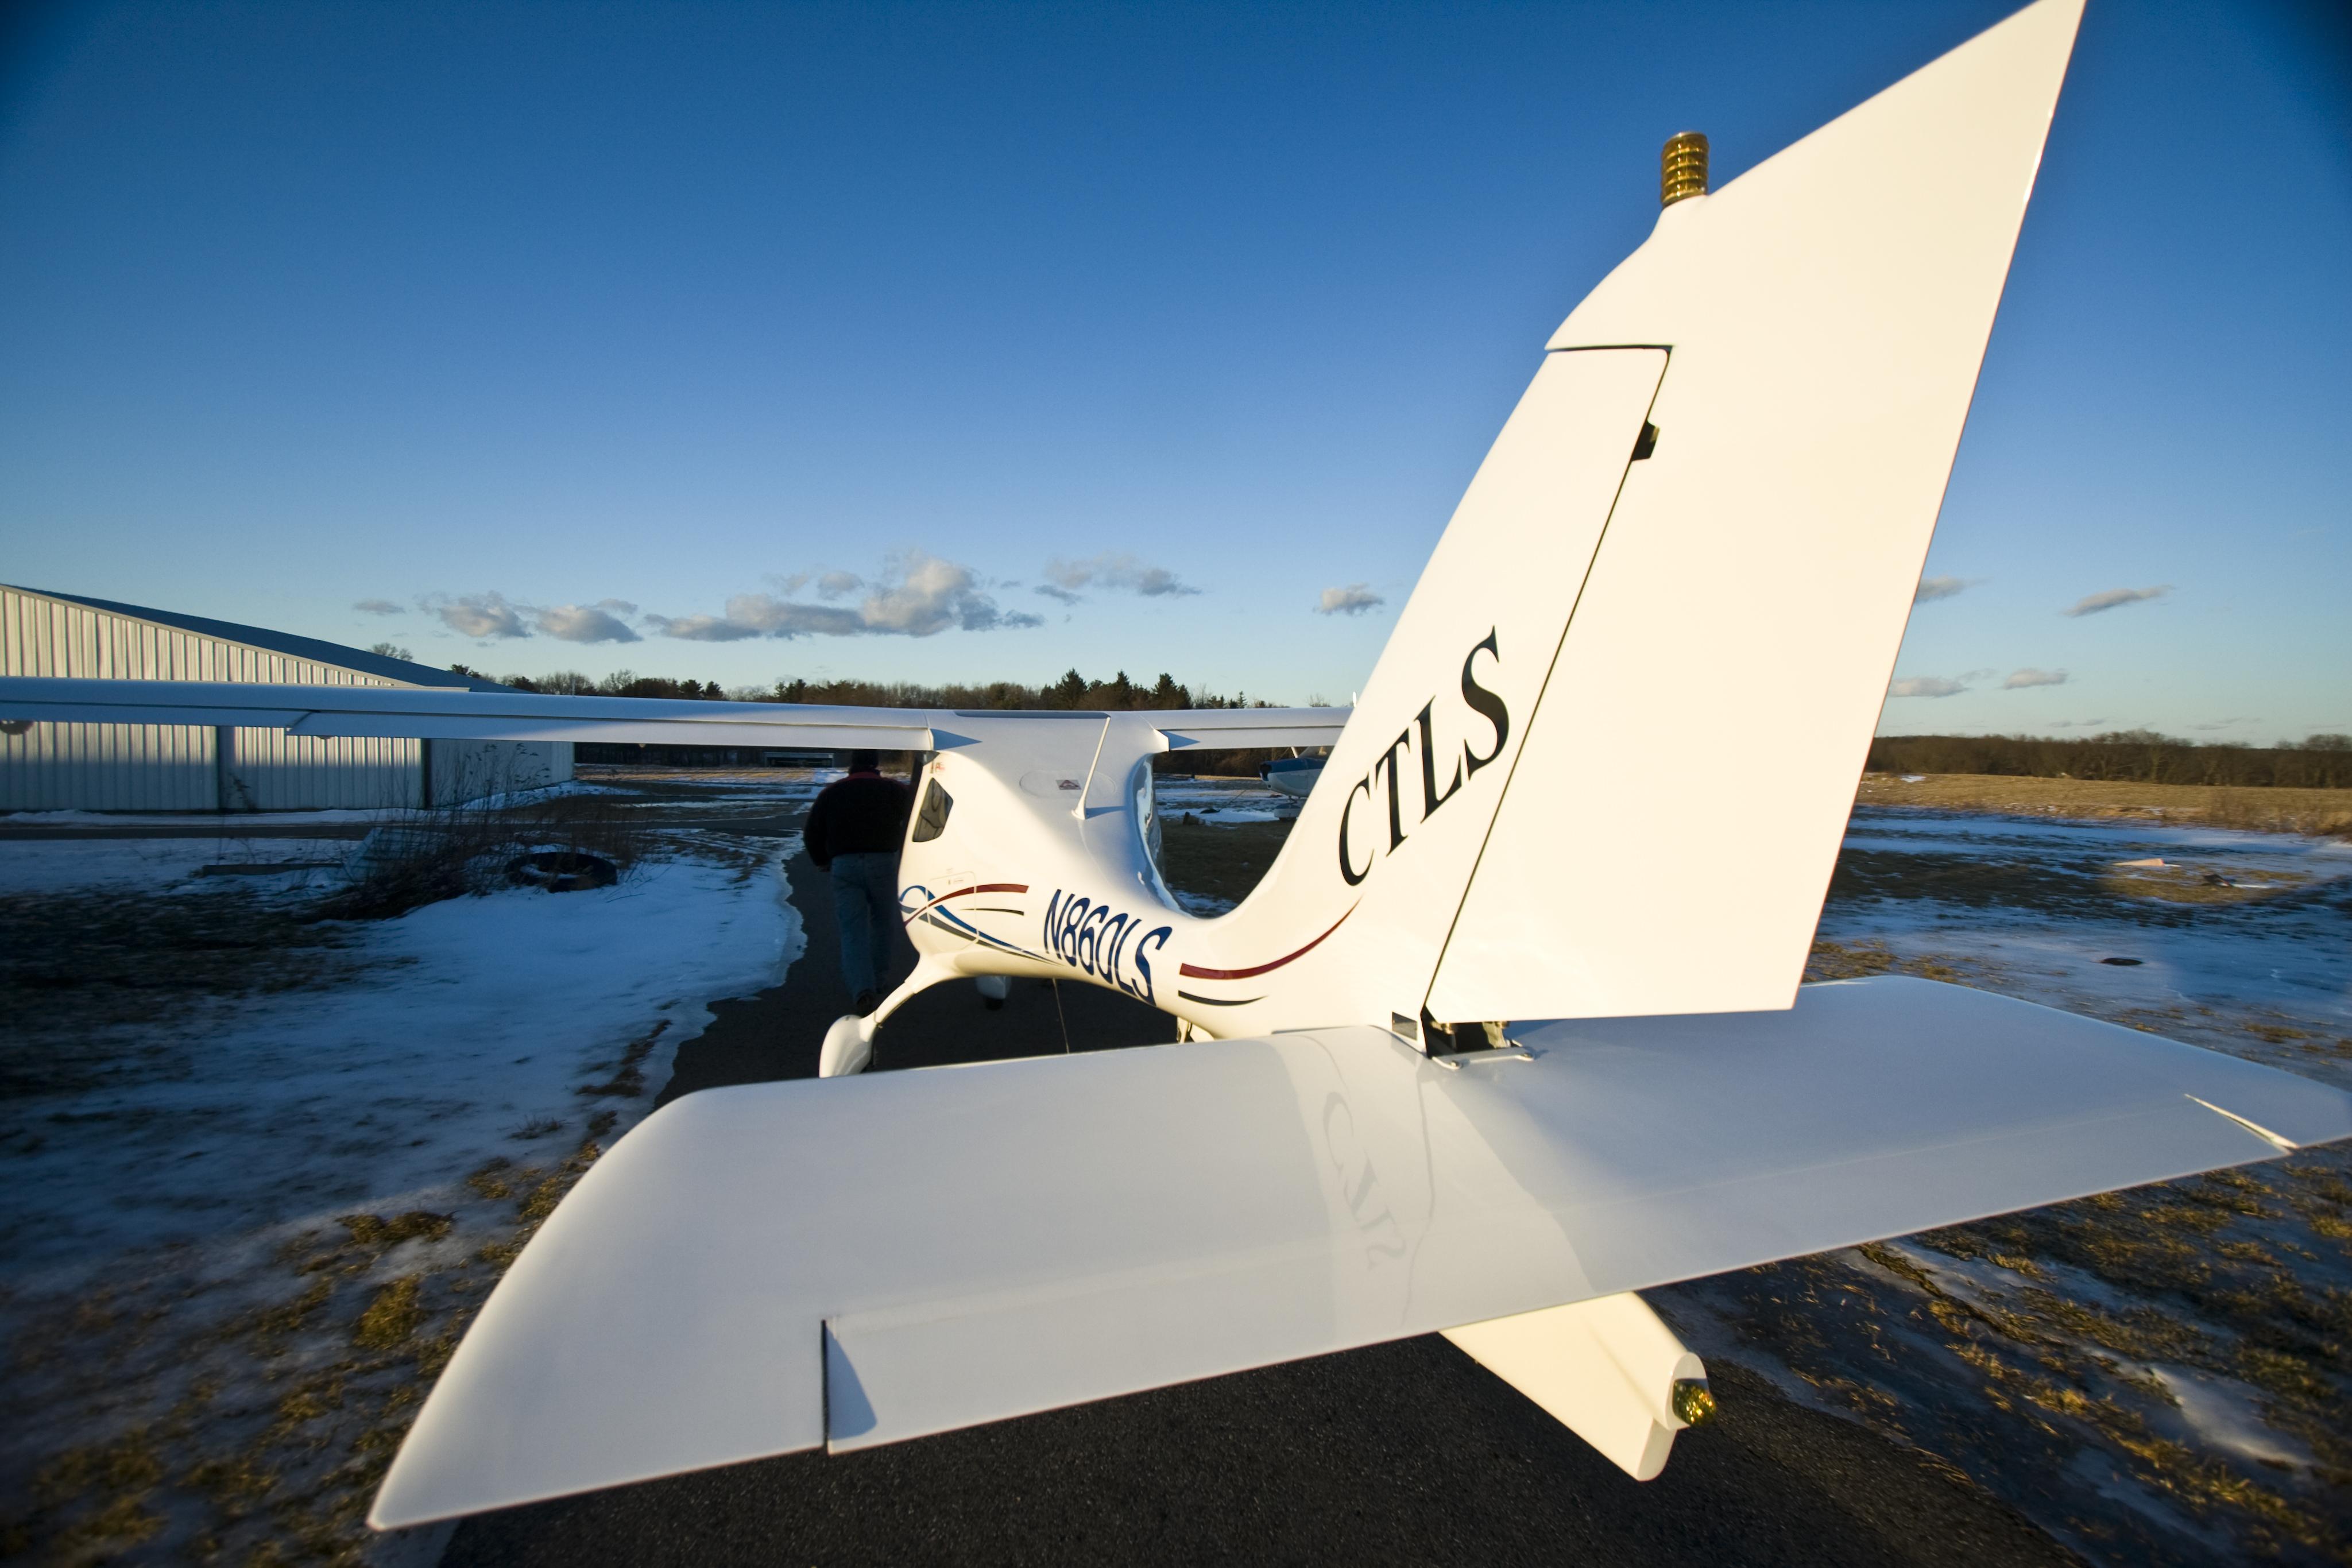 Ground forward over tail- Blue sky